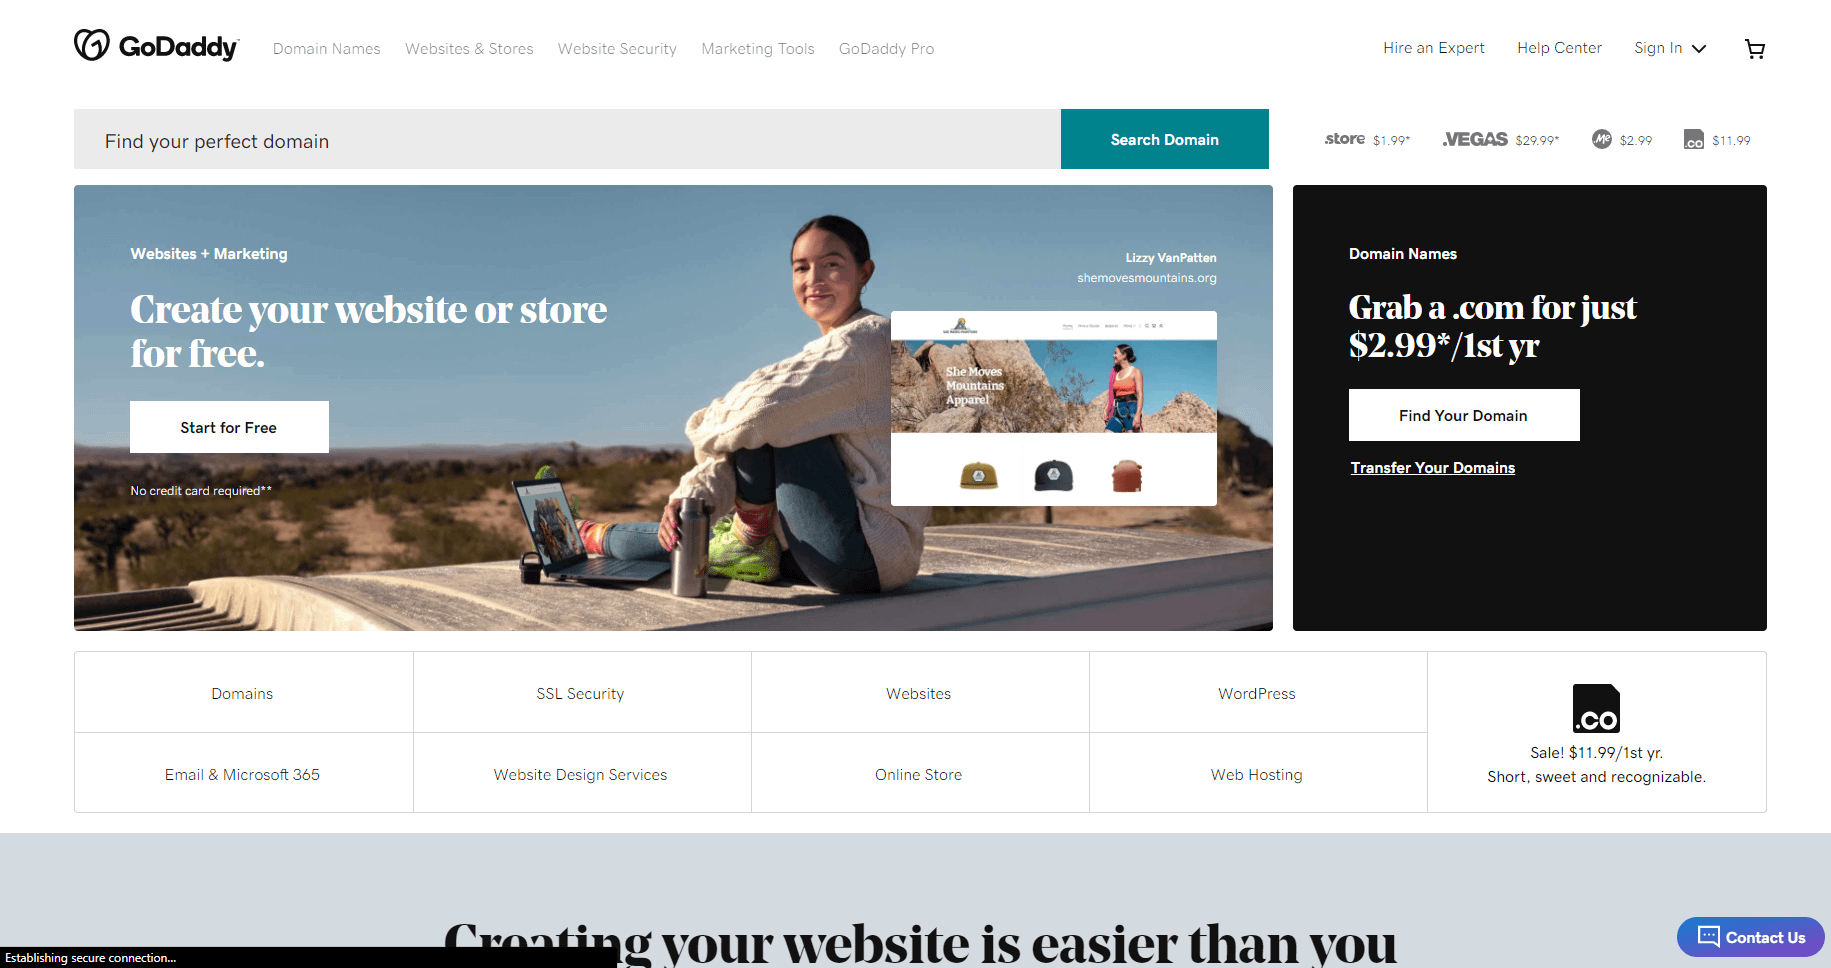 eCommerce software and marketing GoDaddy screenshot